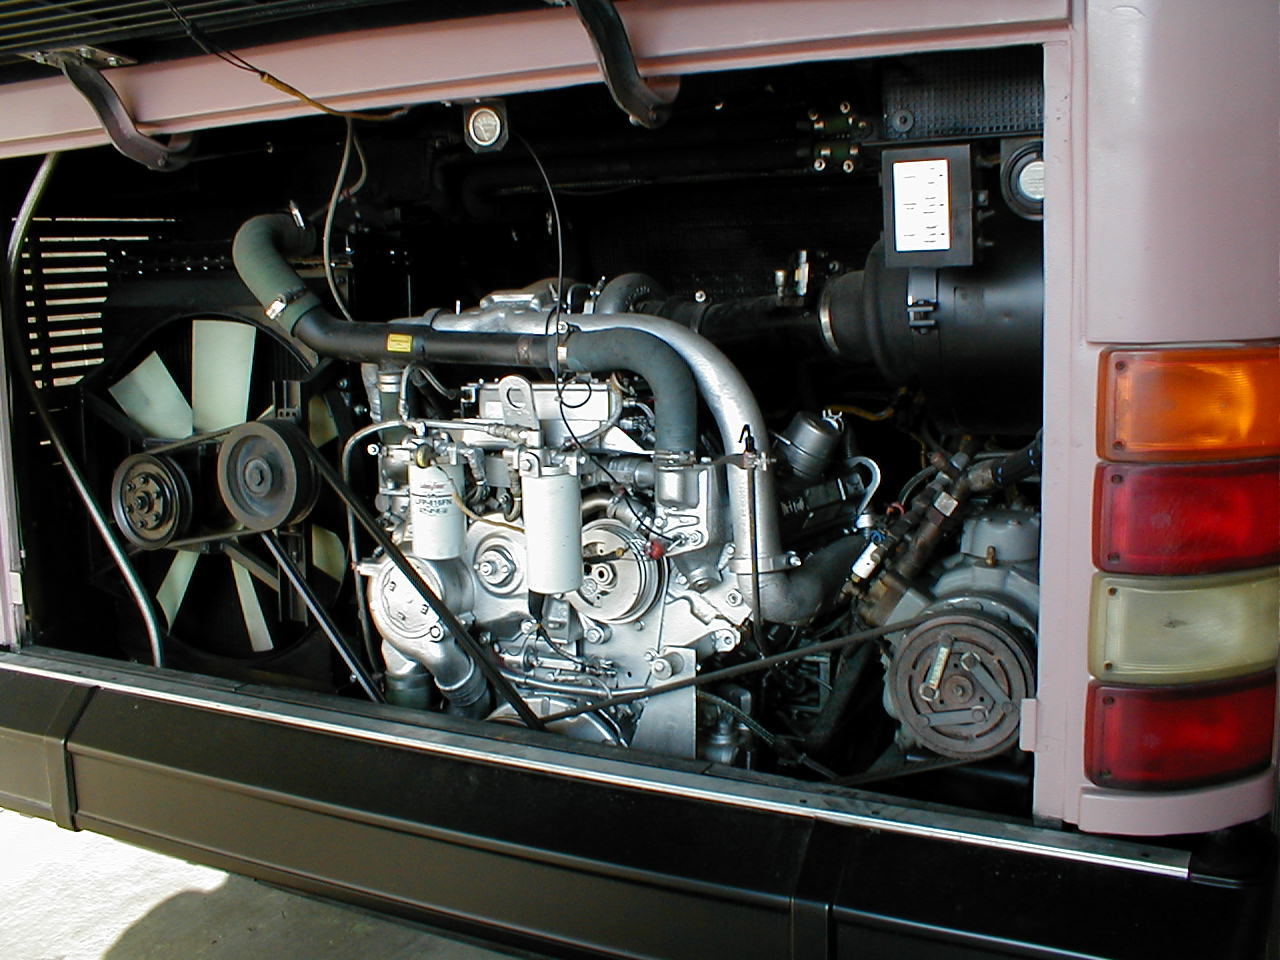 . : Vehicle Radiators & Parts